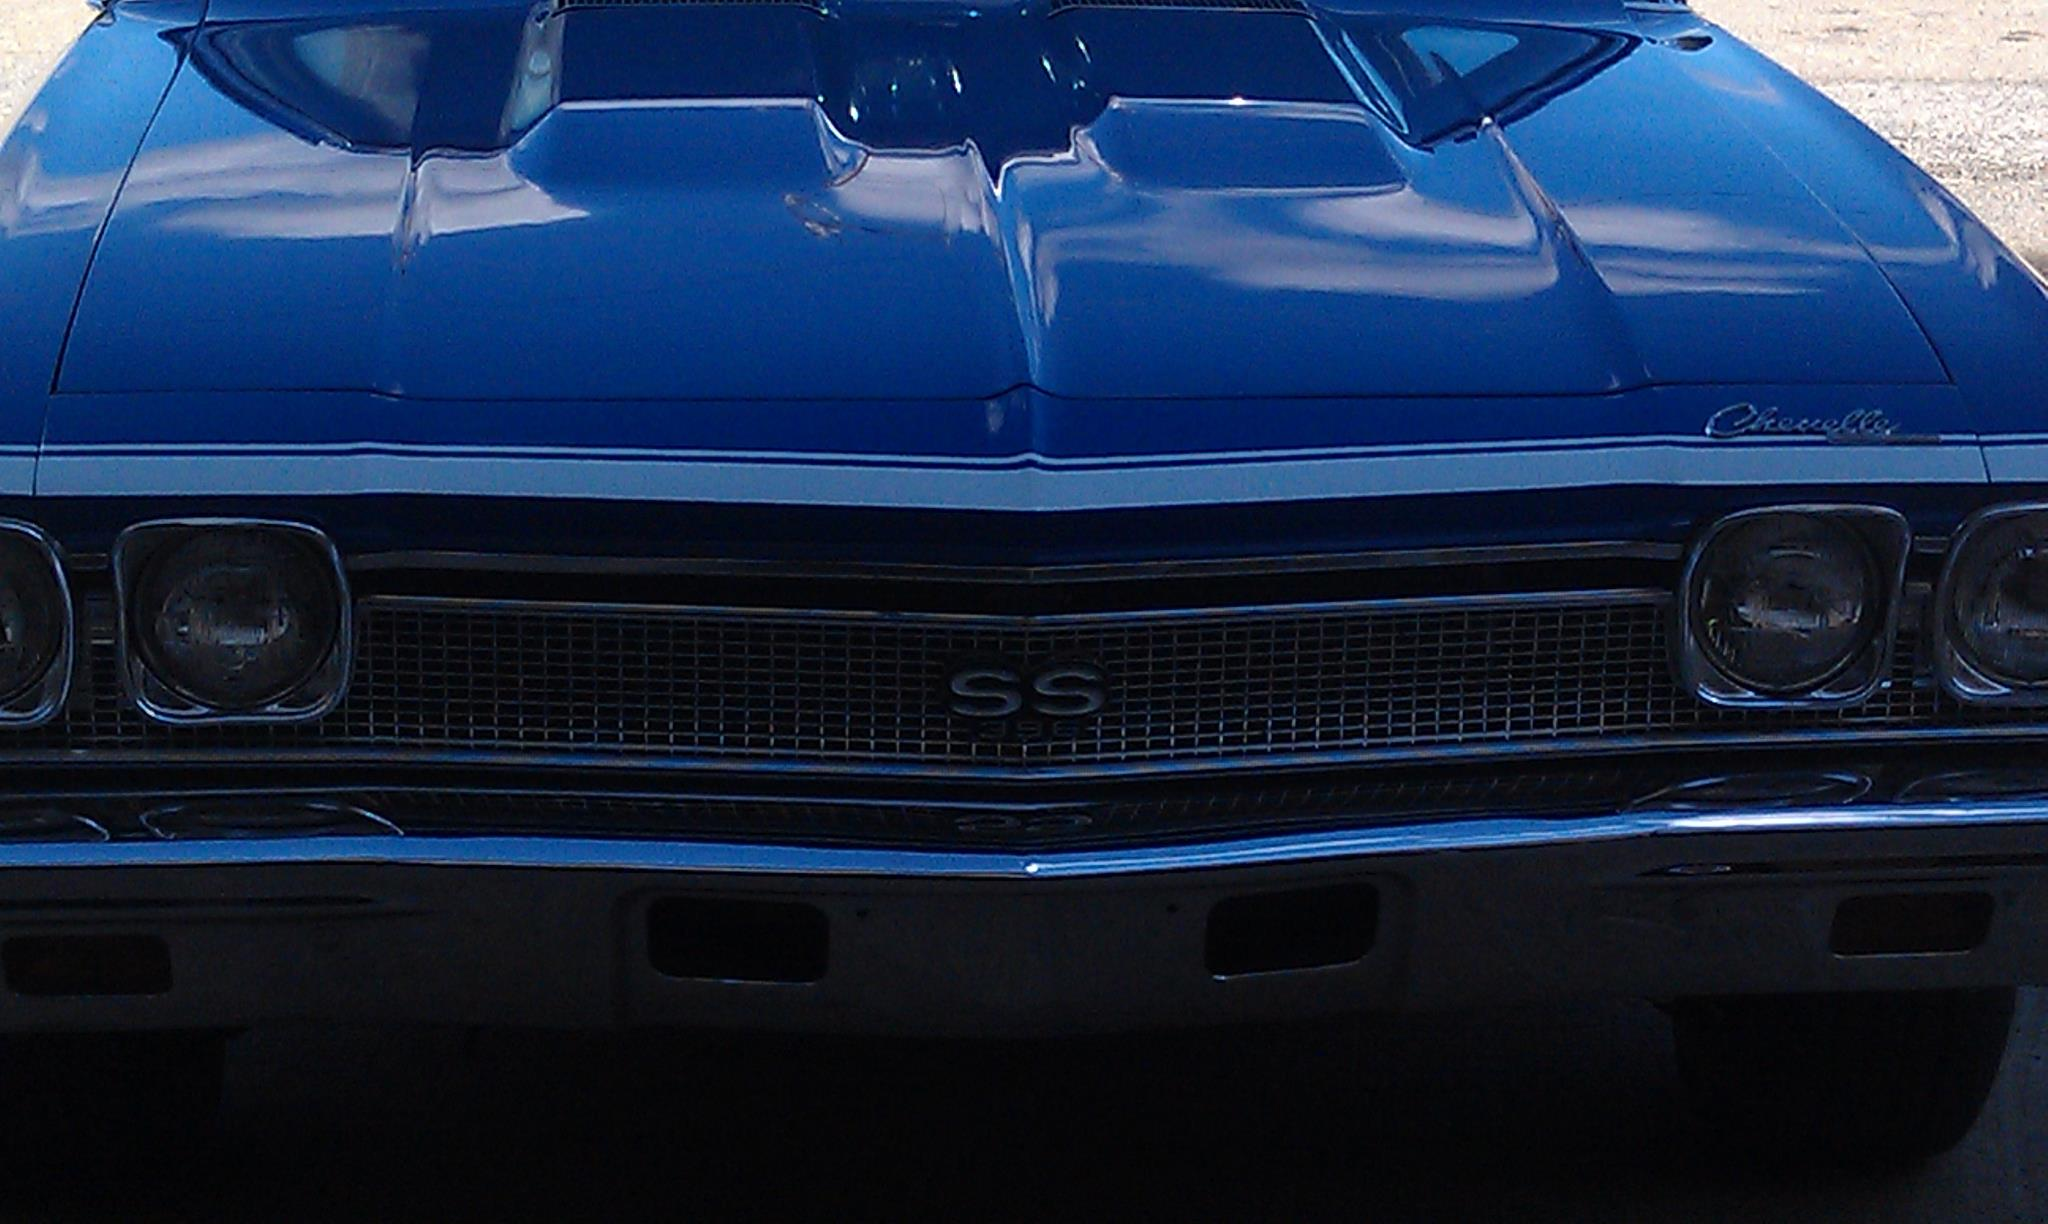 Classic Car Muscle Car Hot Rod Vintage Service Restoration - Muscle car repair